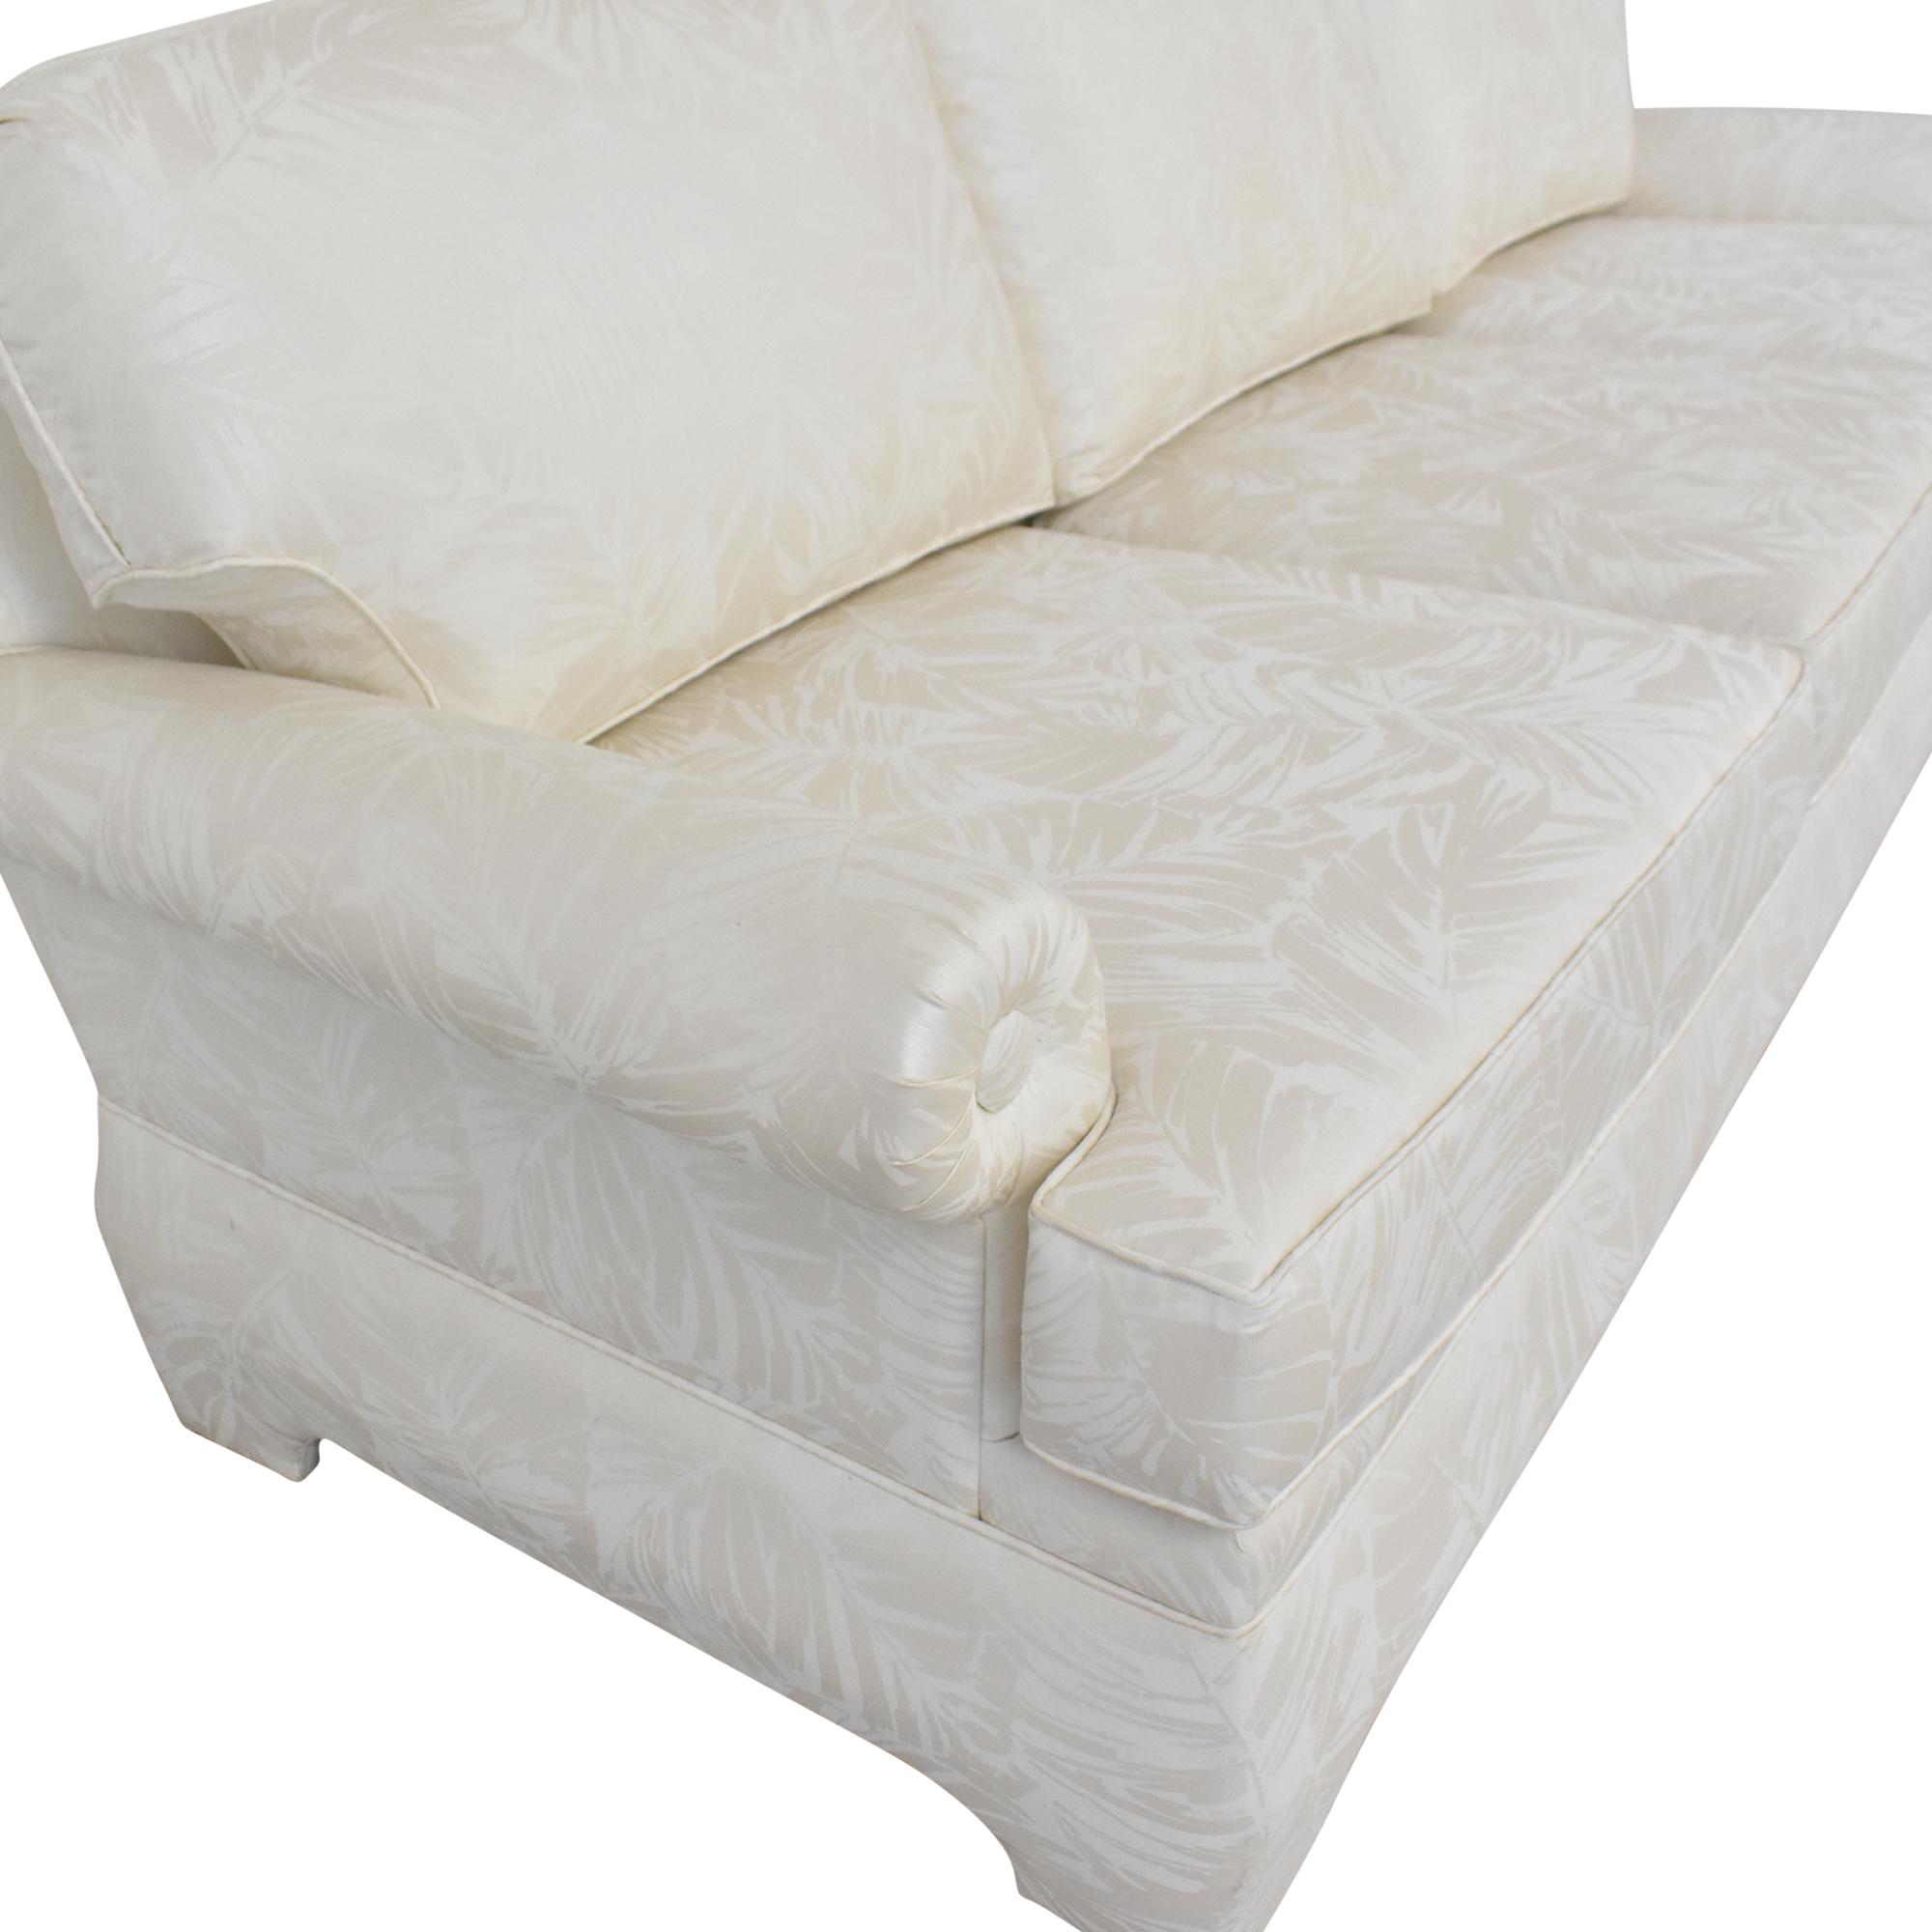 The Sofa Factory Three Cushion Sofa / Classic Sofas